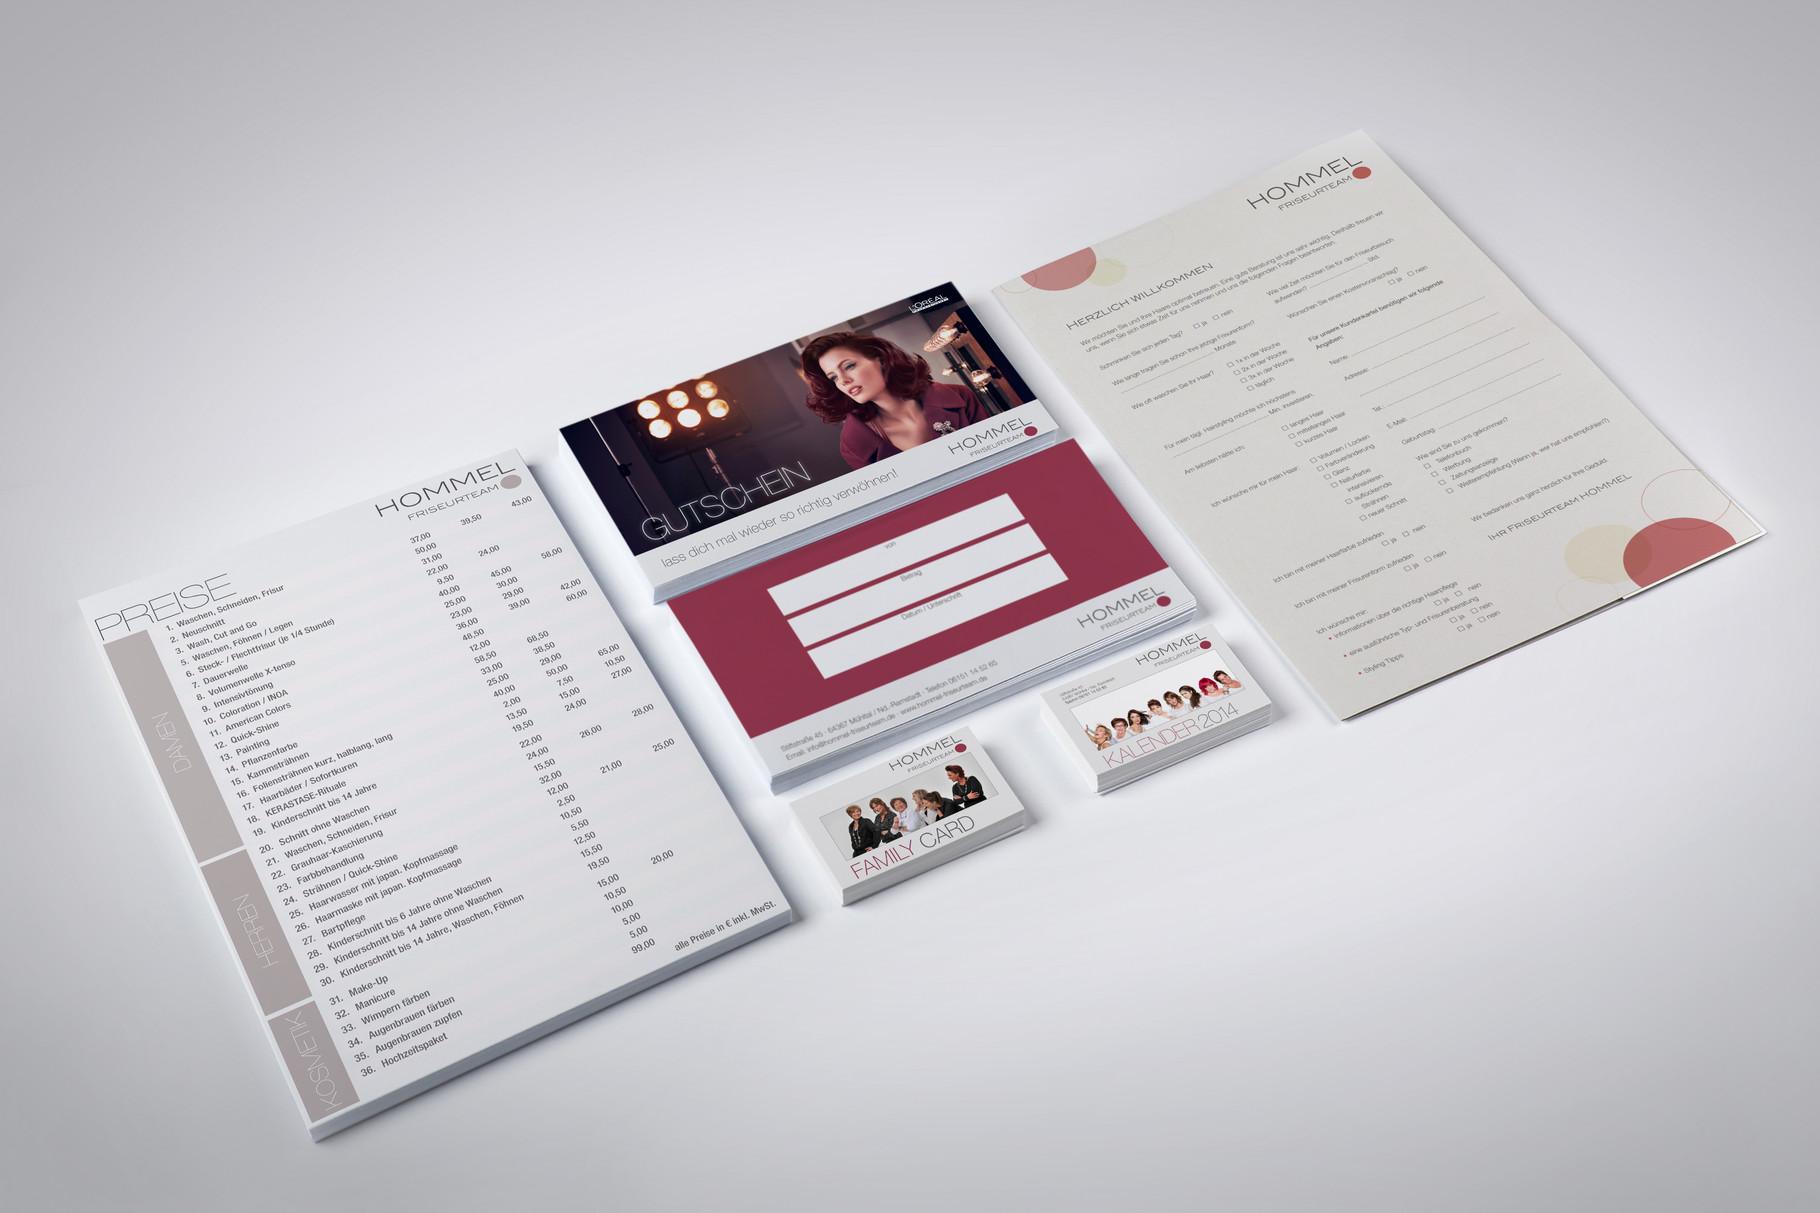 Corporate Design, Logoentwicklung, Logo, Grafikdesign, Grafik, Gestaltung, Hommel Geschäftsausstattung